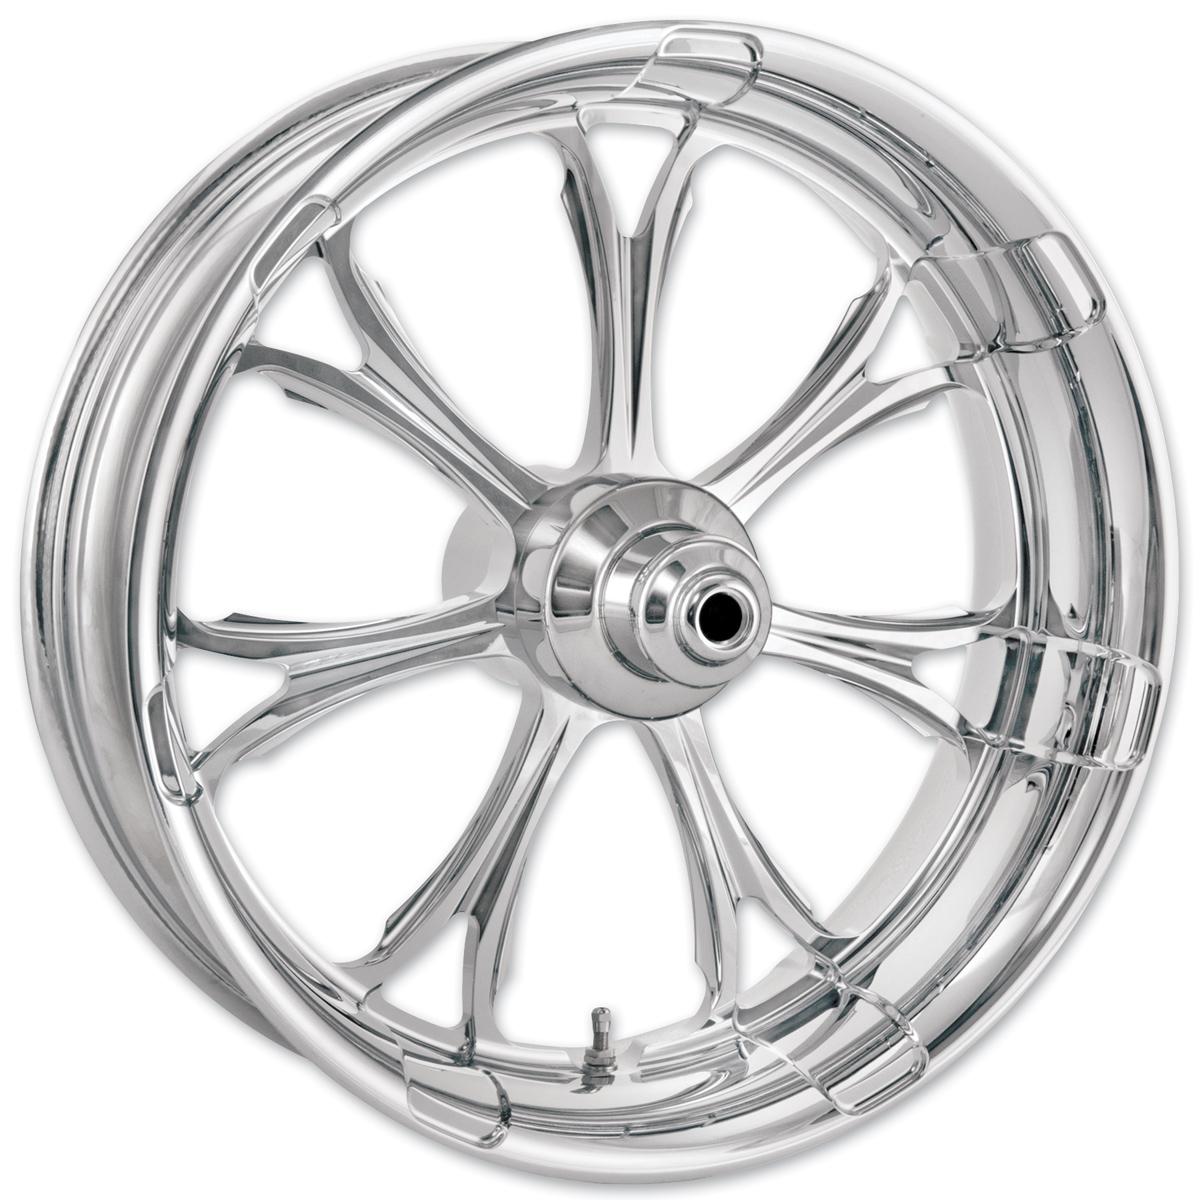 Performance Machine Paramount Chrome Front Wheel 21x3.5 ABS